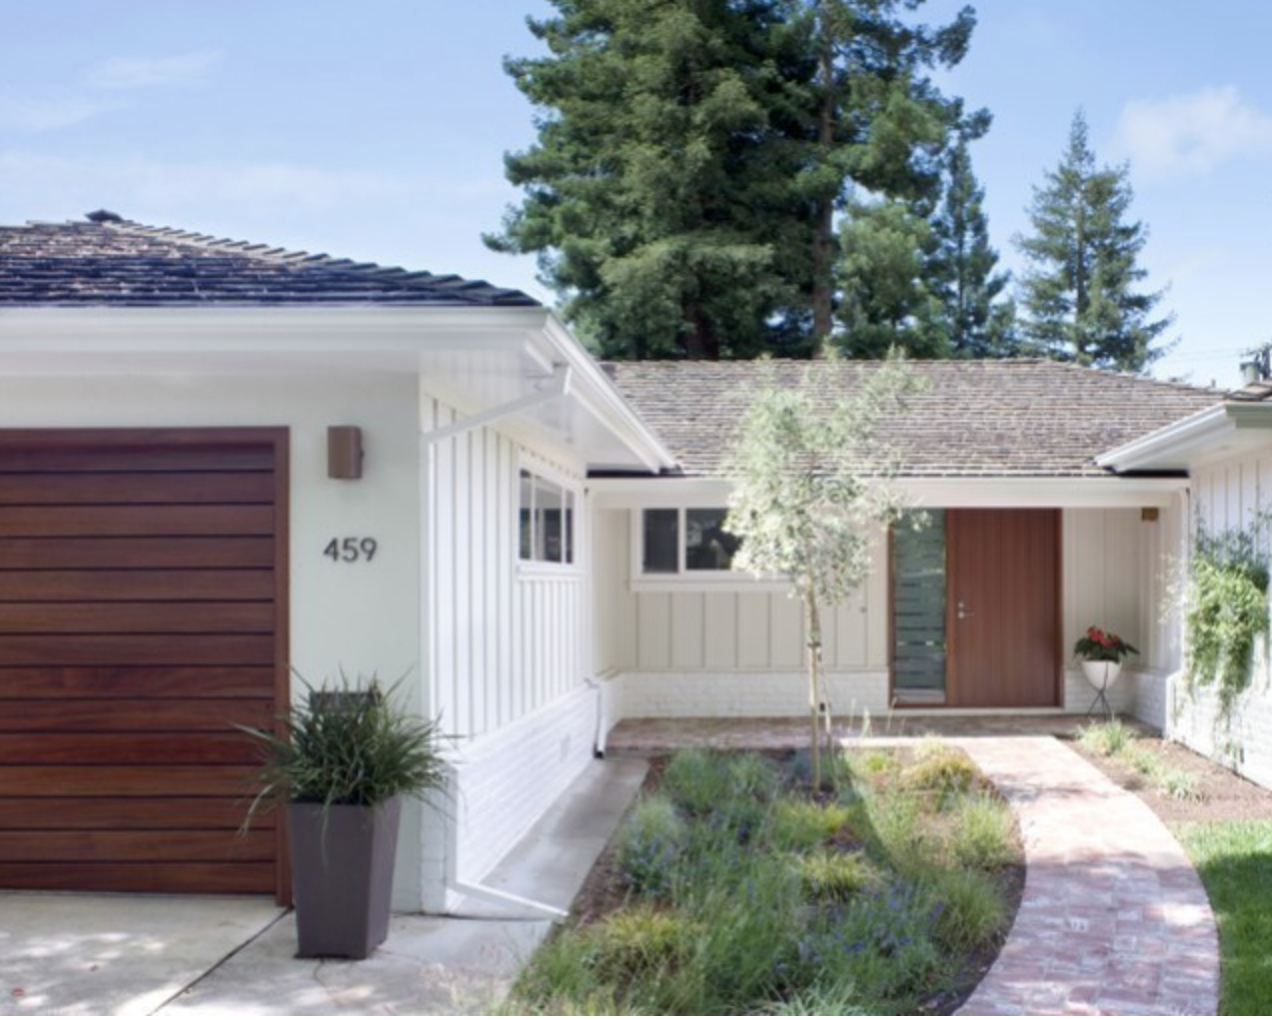 10 Stunning Home Exteriors with Board and Batten Siding #boardandbattensiding